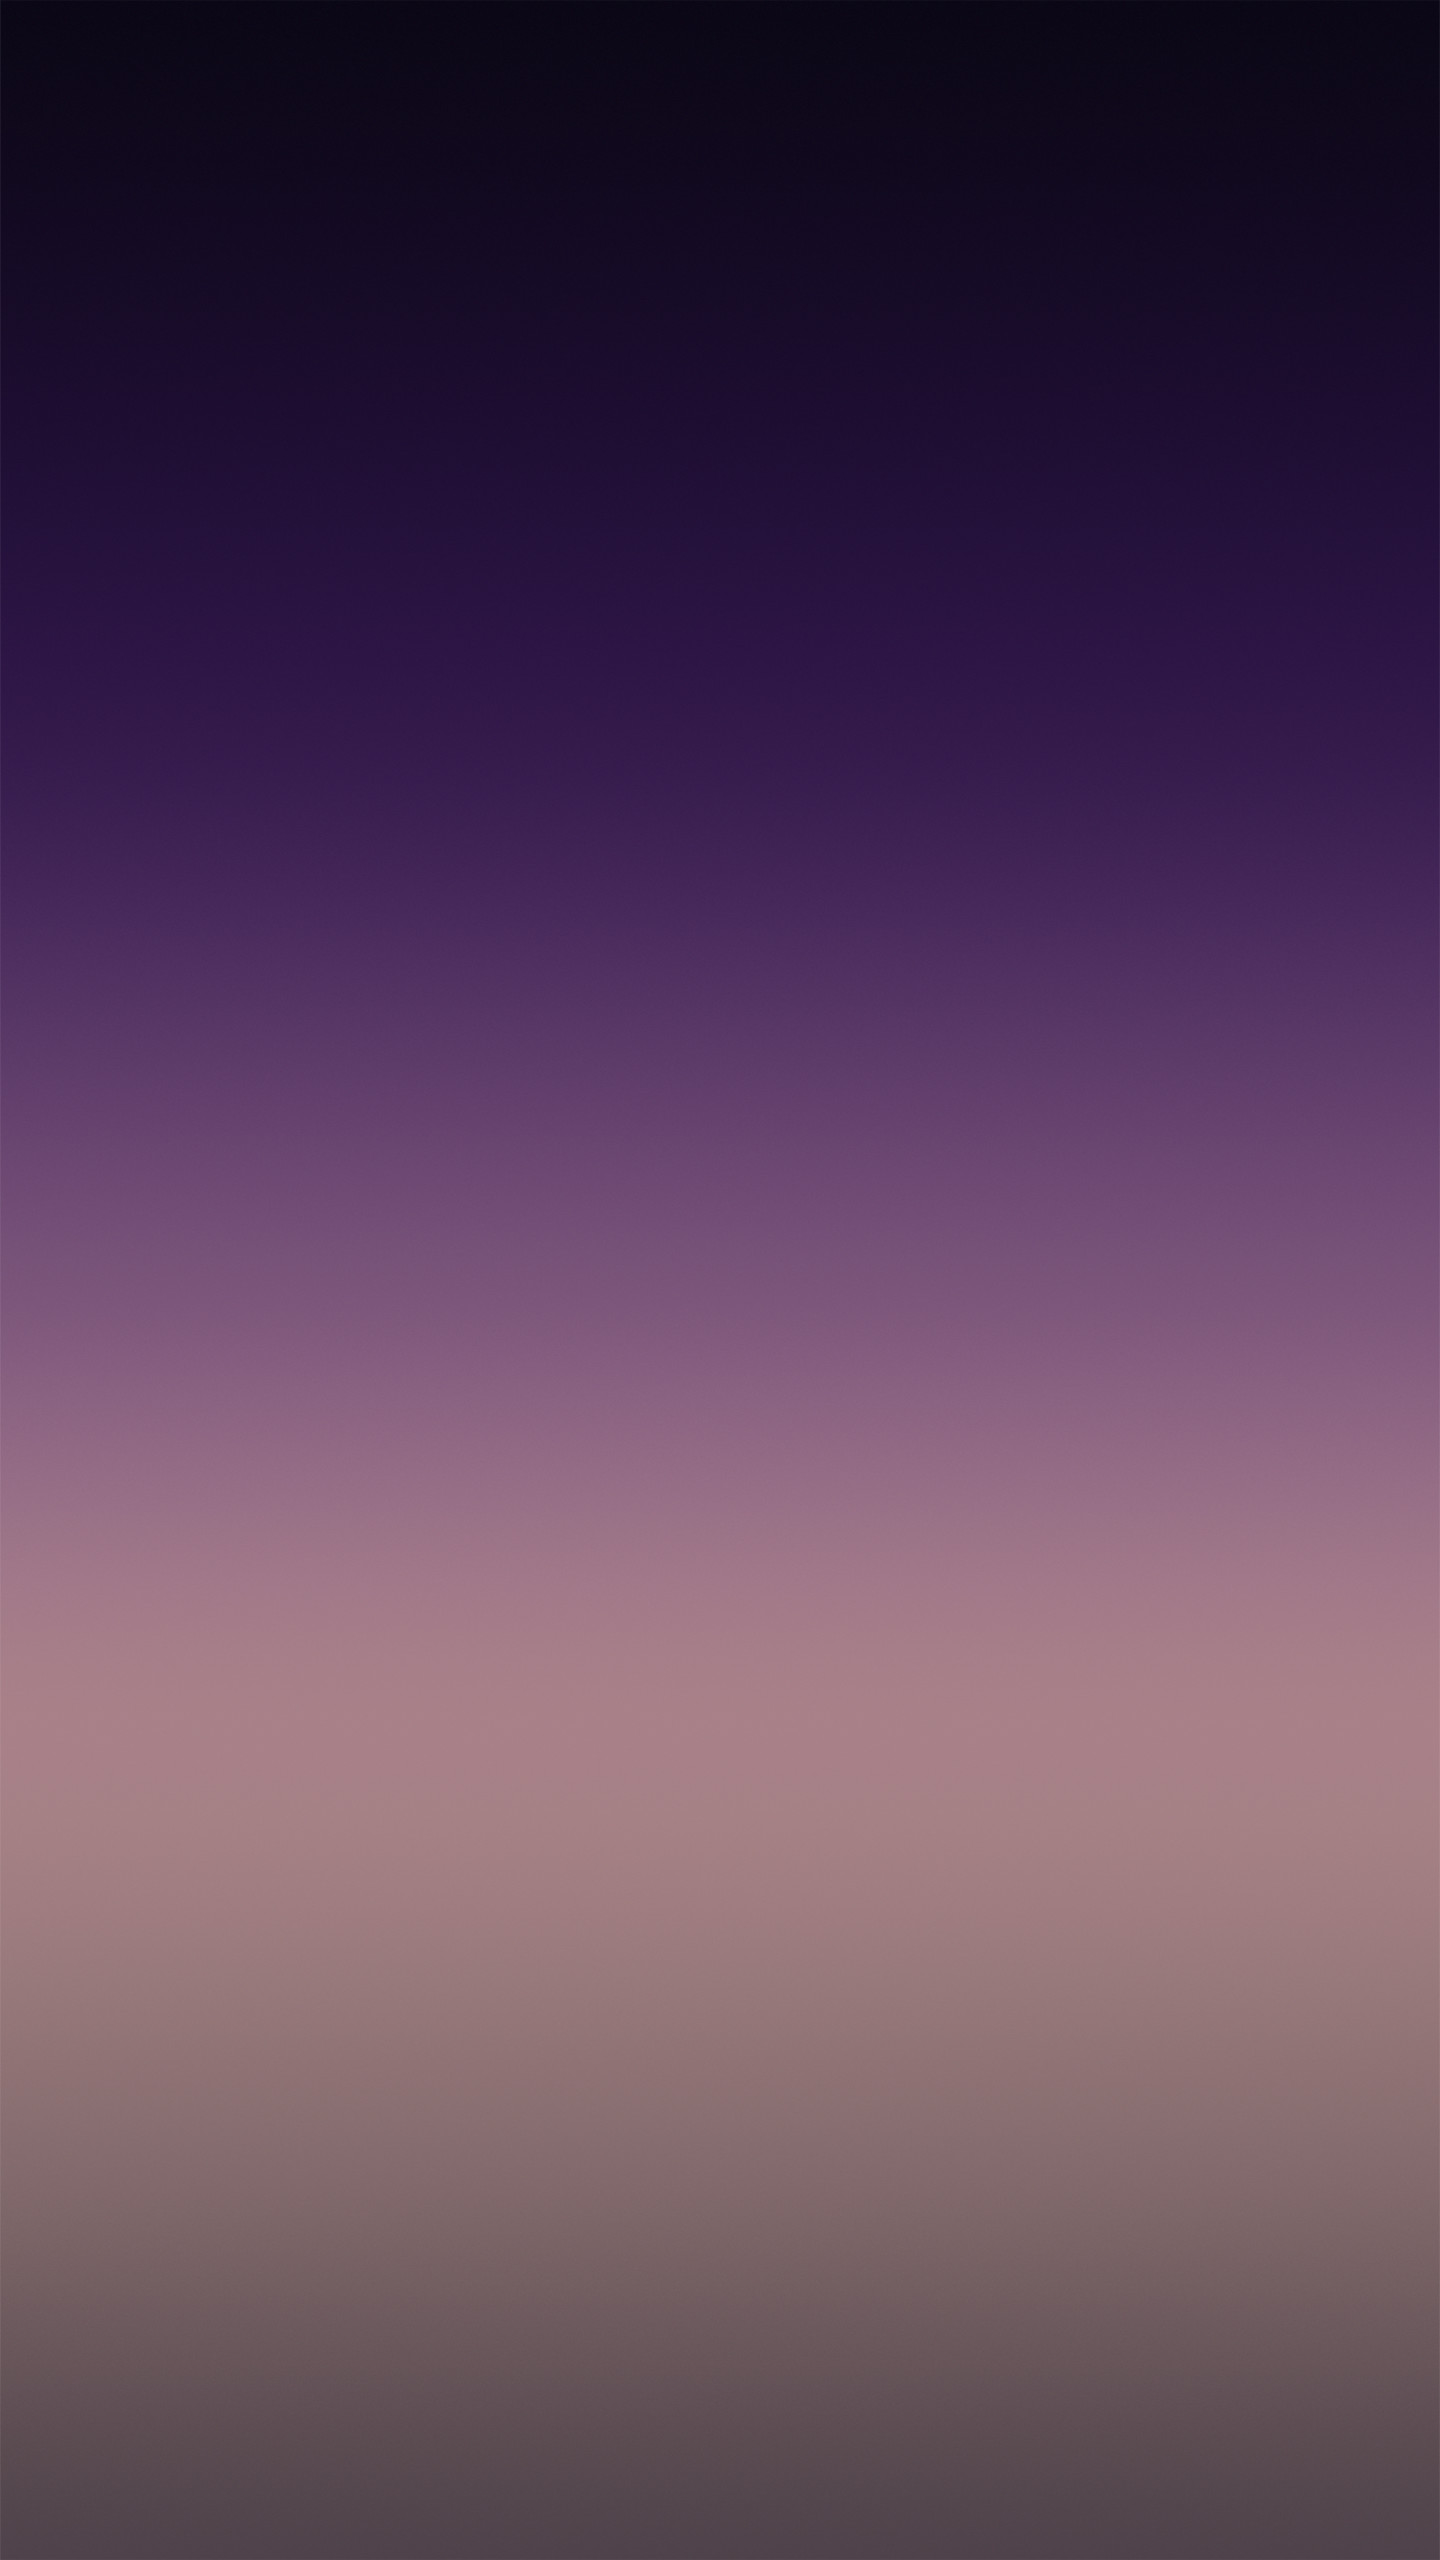 Wallpaper · 1440×2560